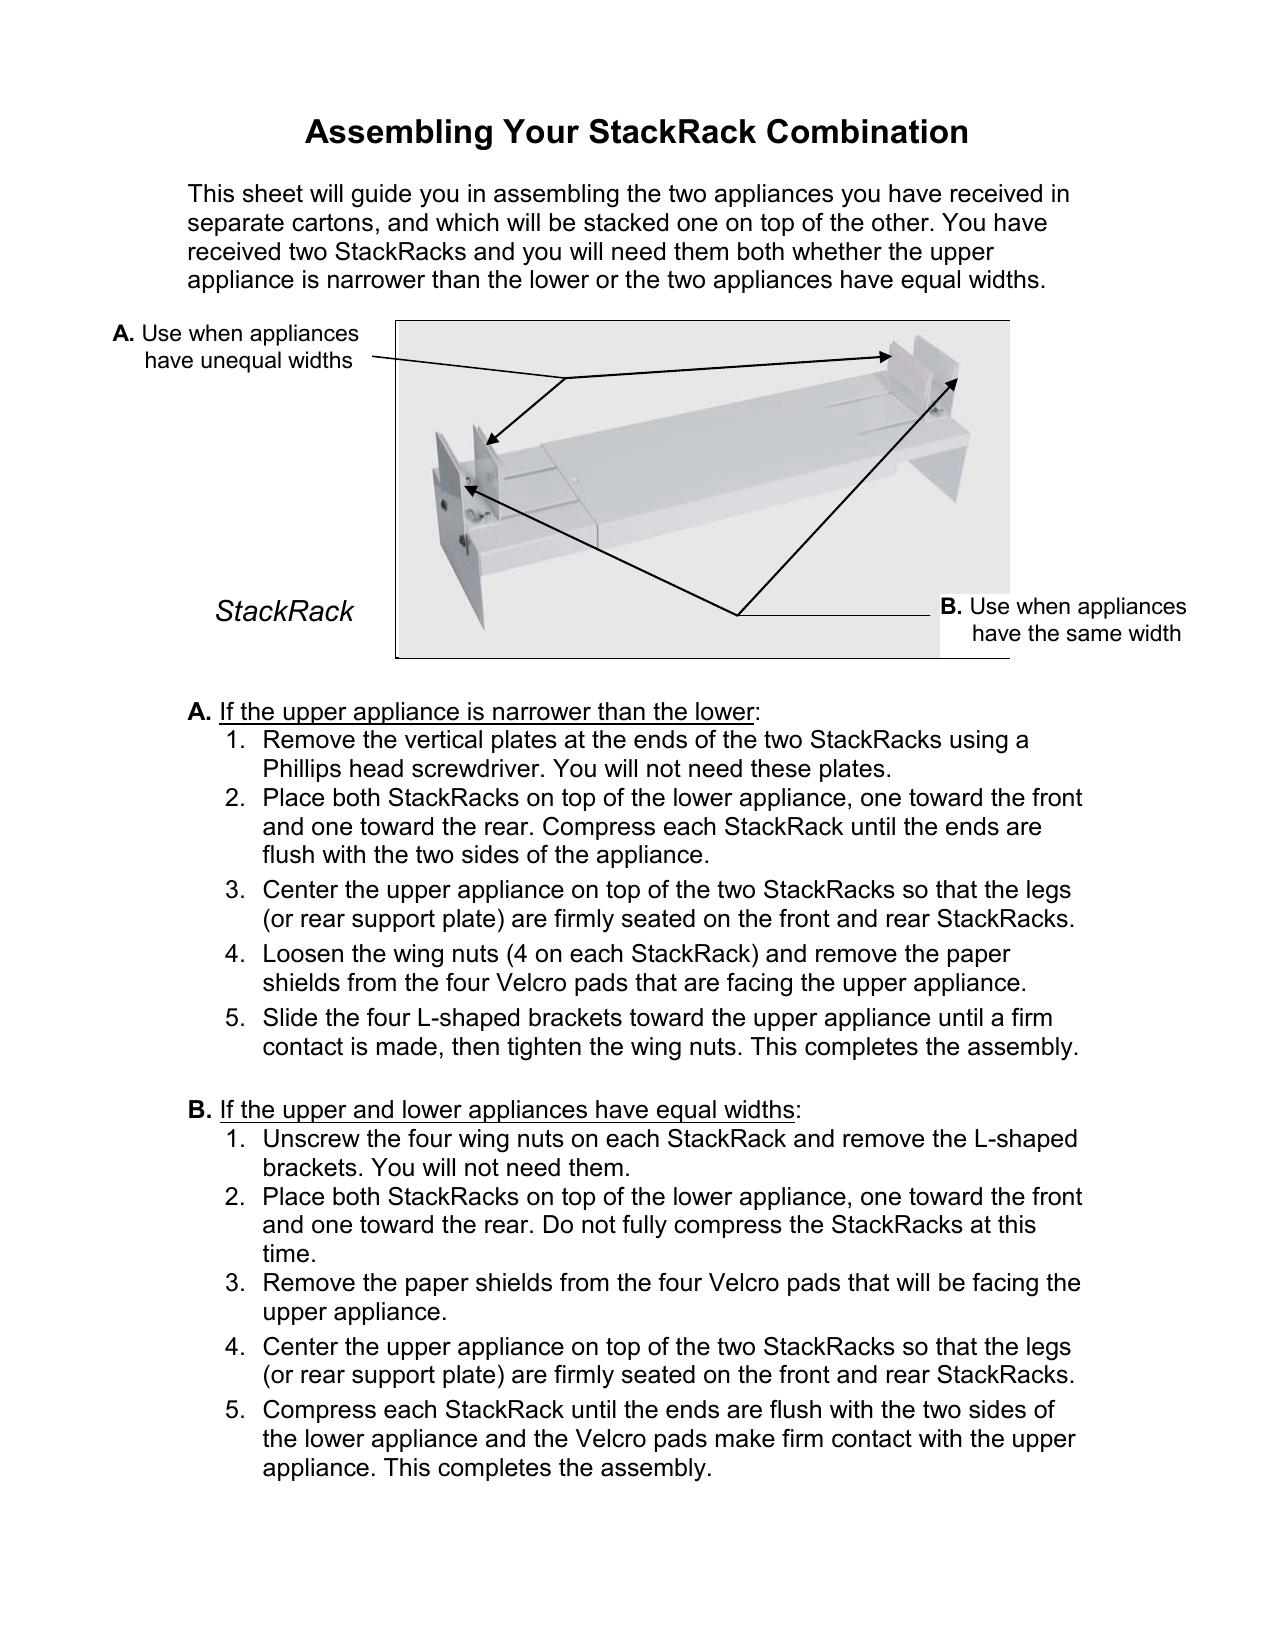 Summit STACKINGRACK StackRackuniversalinstructions.pdf | Manualzz